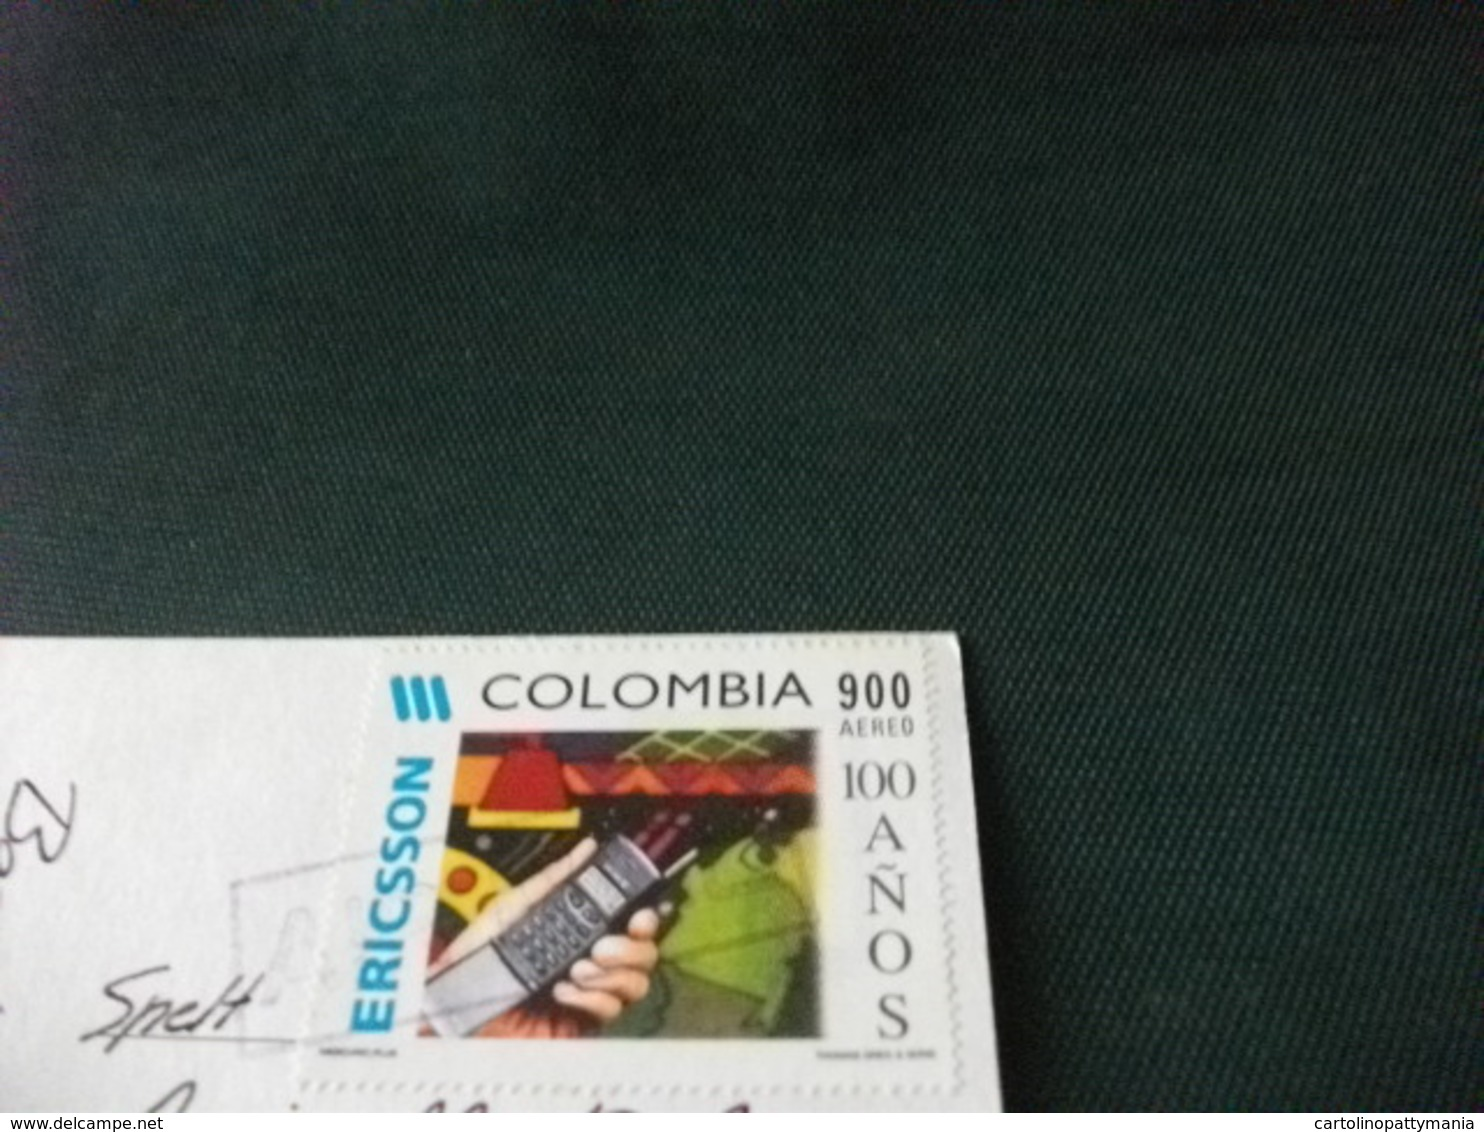 STORIA POSTALE  FRANCOBOLLO COLOMBIA BOGOTA' PANORAMA AEREO - Colombia